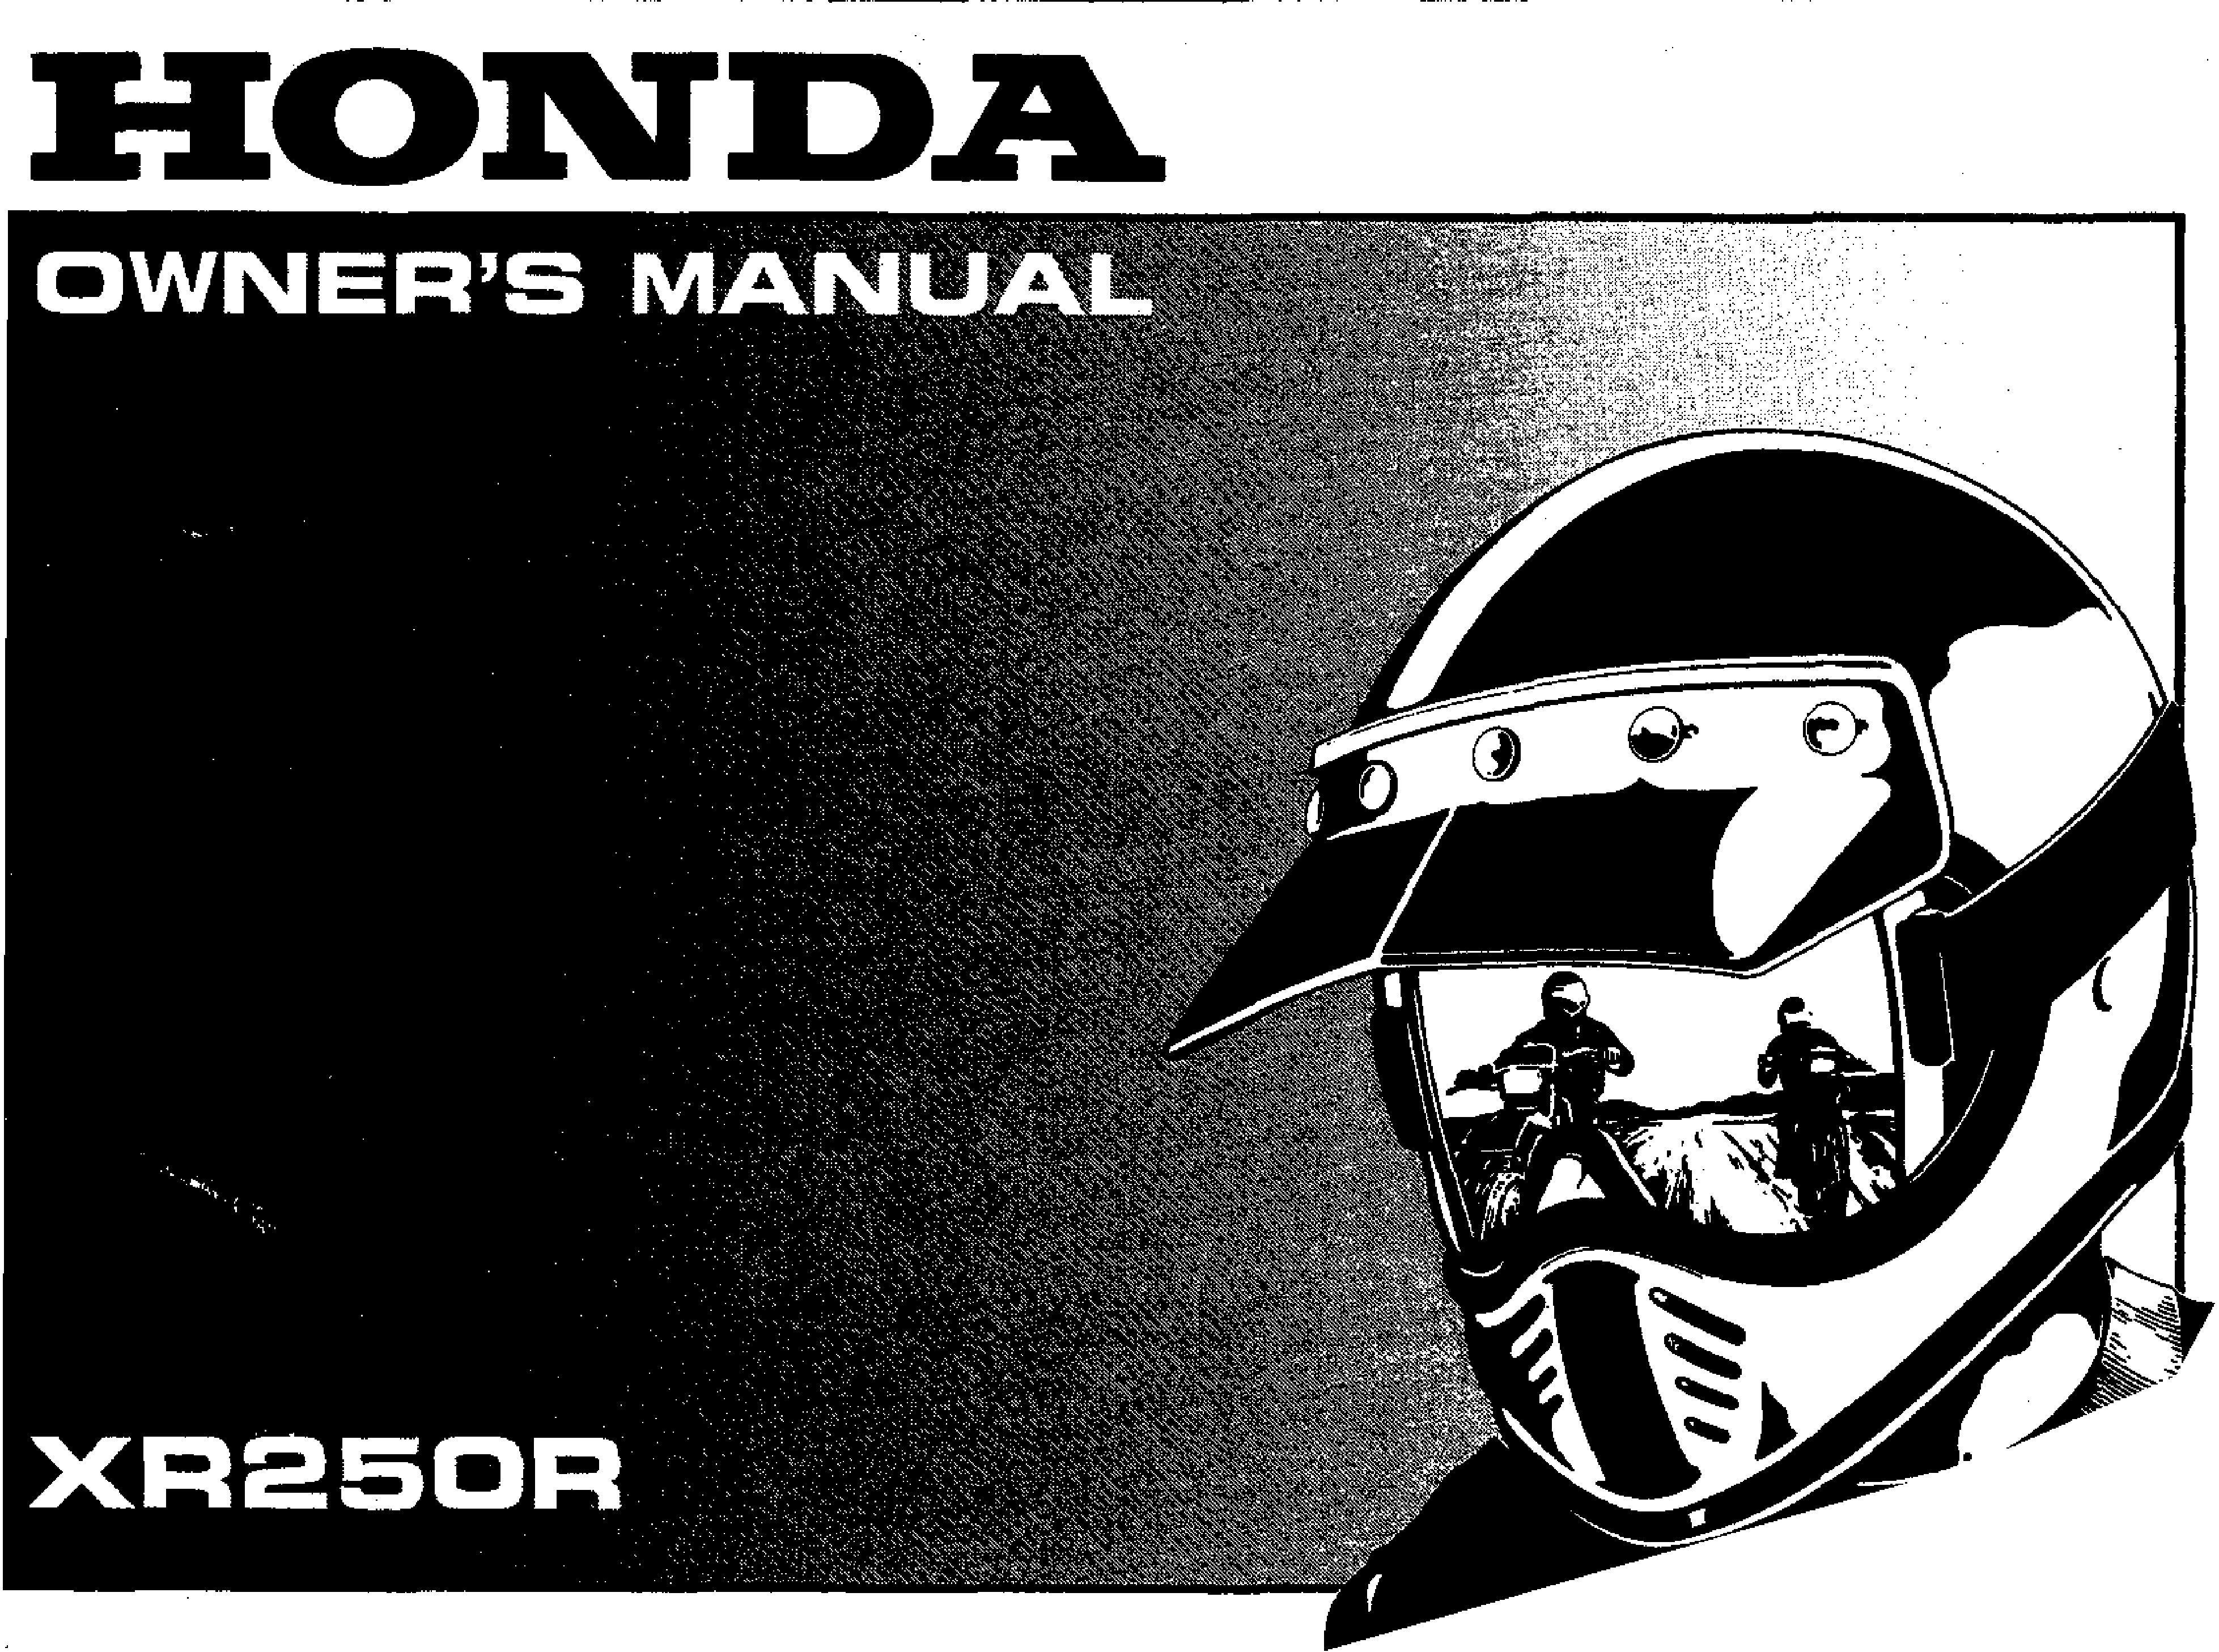 Owner's manual for Honda XR250R (1999)